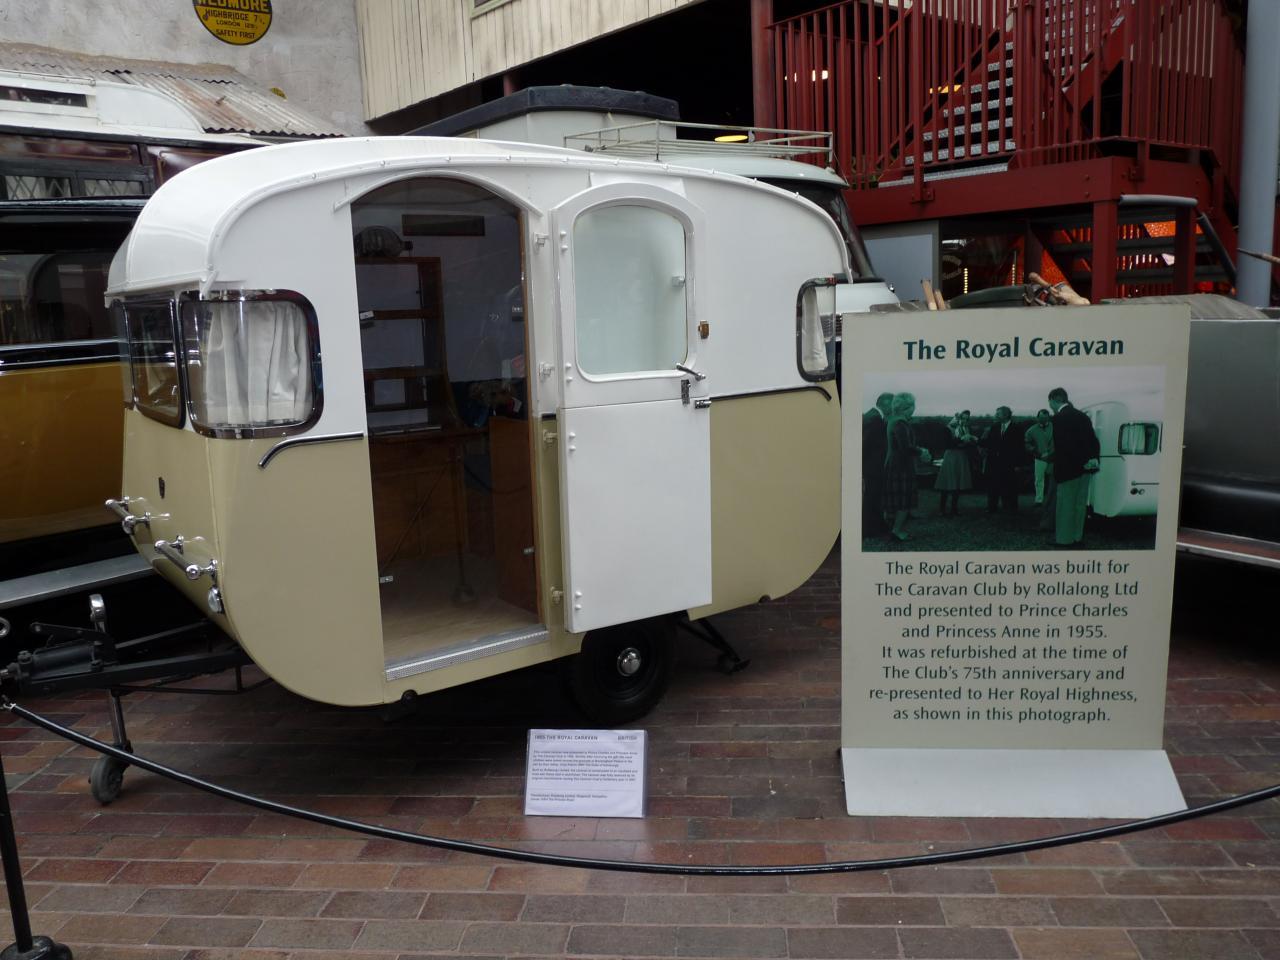 Motor museum Beaulieu, Caravane Royale